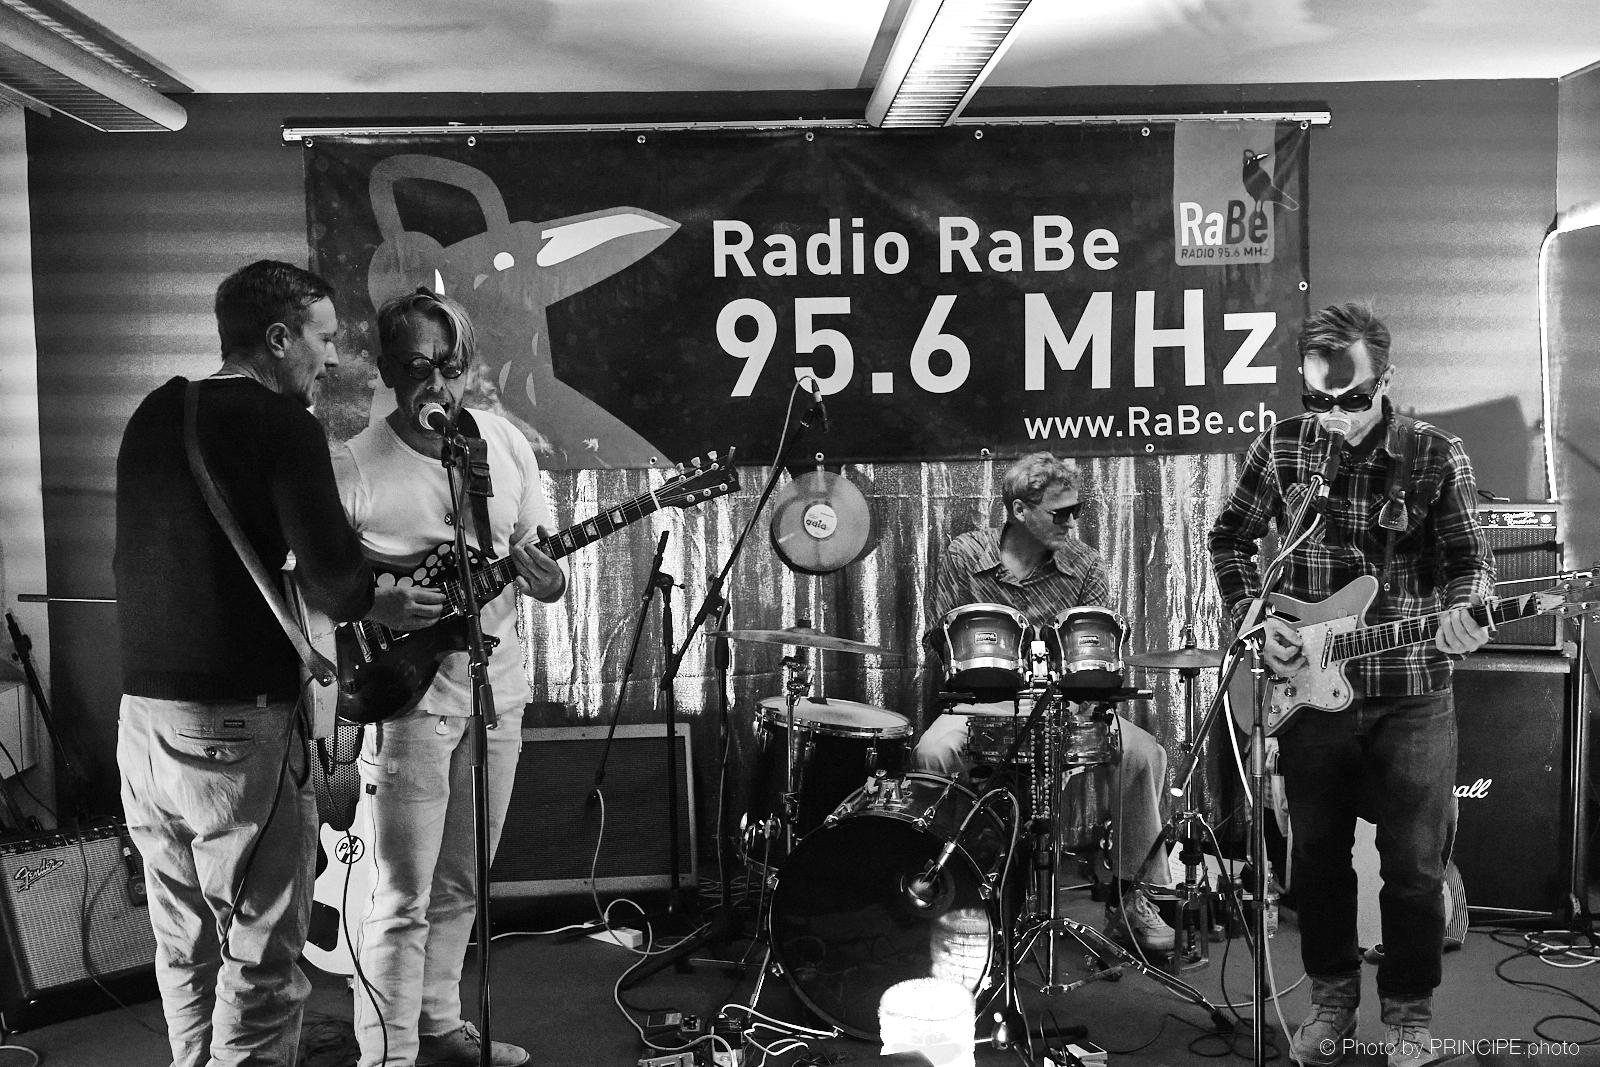 Roy & the Devil's Motorcycle @ 25 Jahre Radio Rabe, Sollbruchstelle